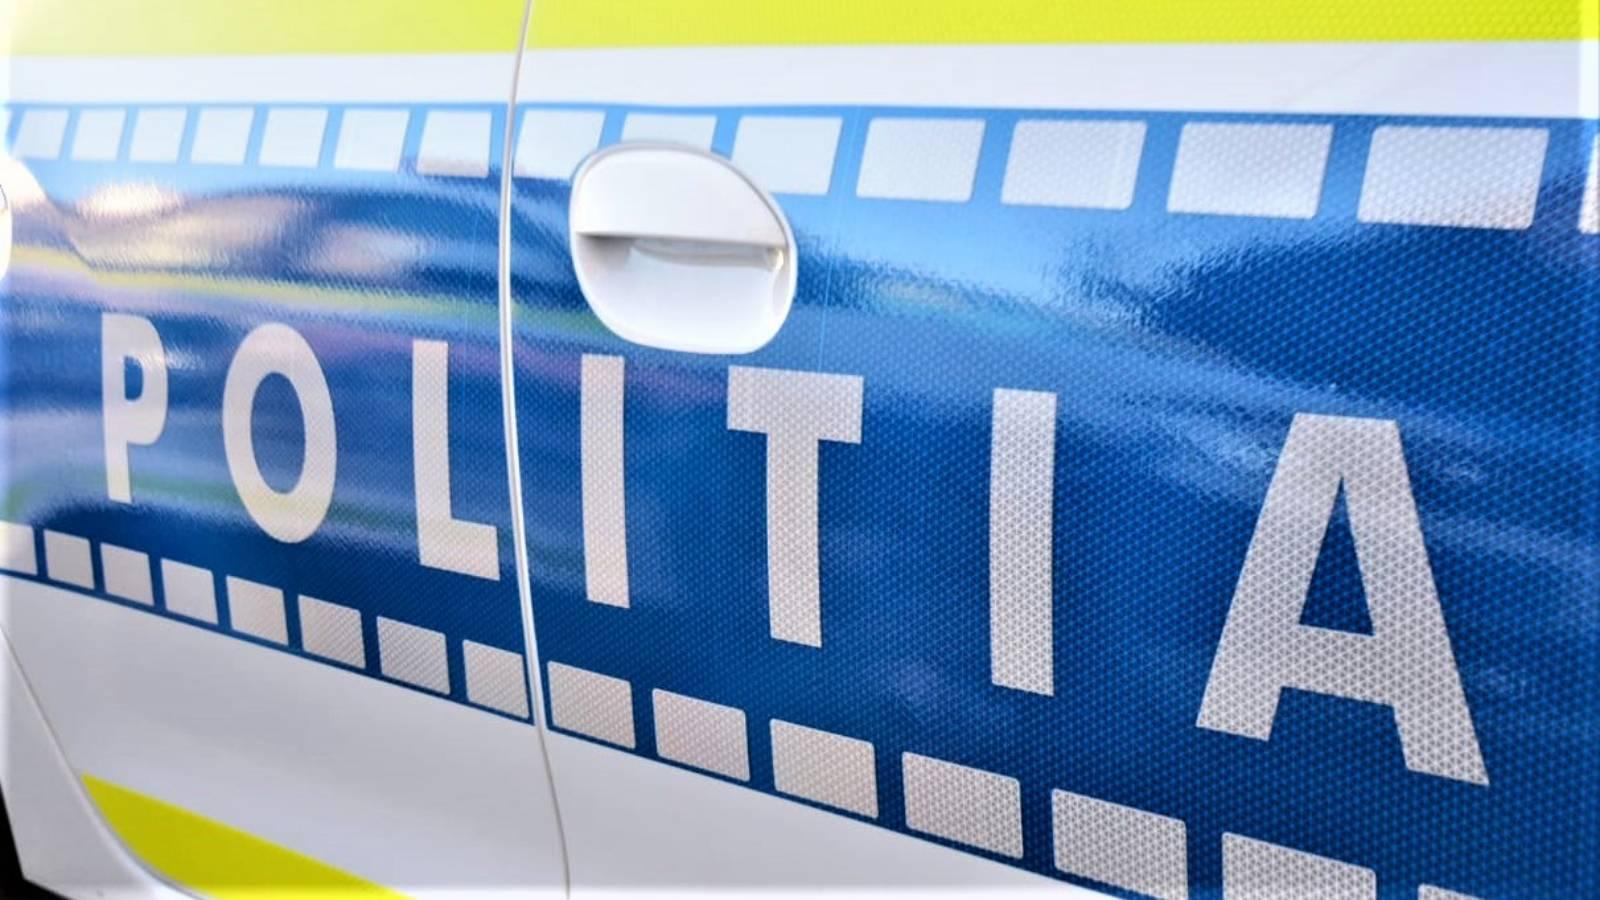 Politia Romana amenzi civil coronavirus